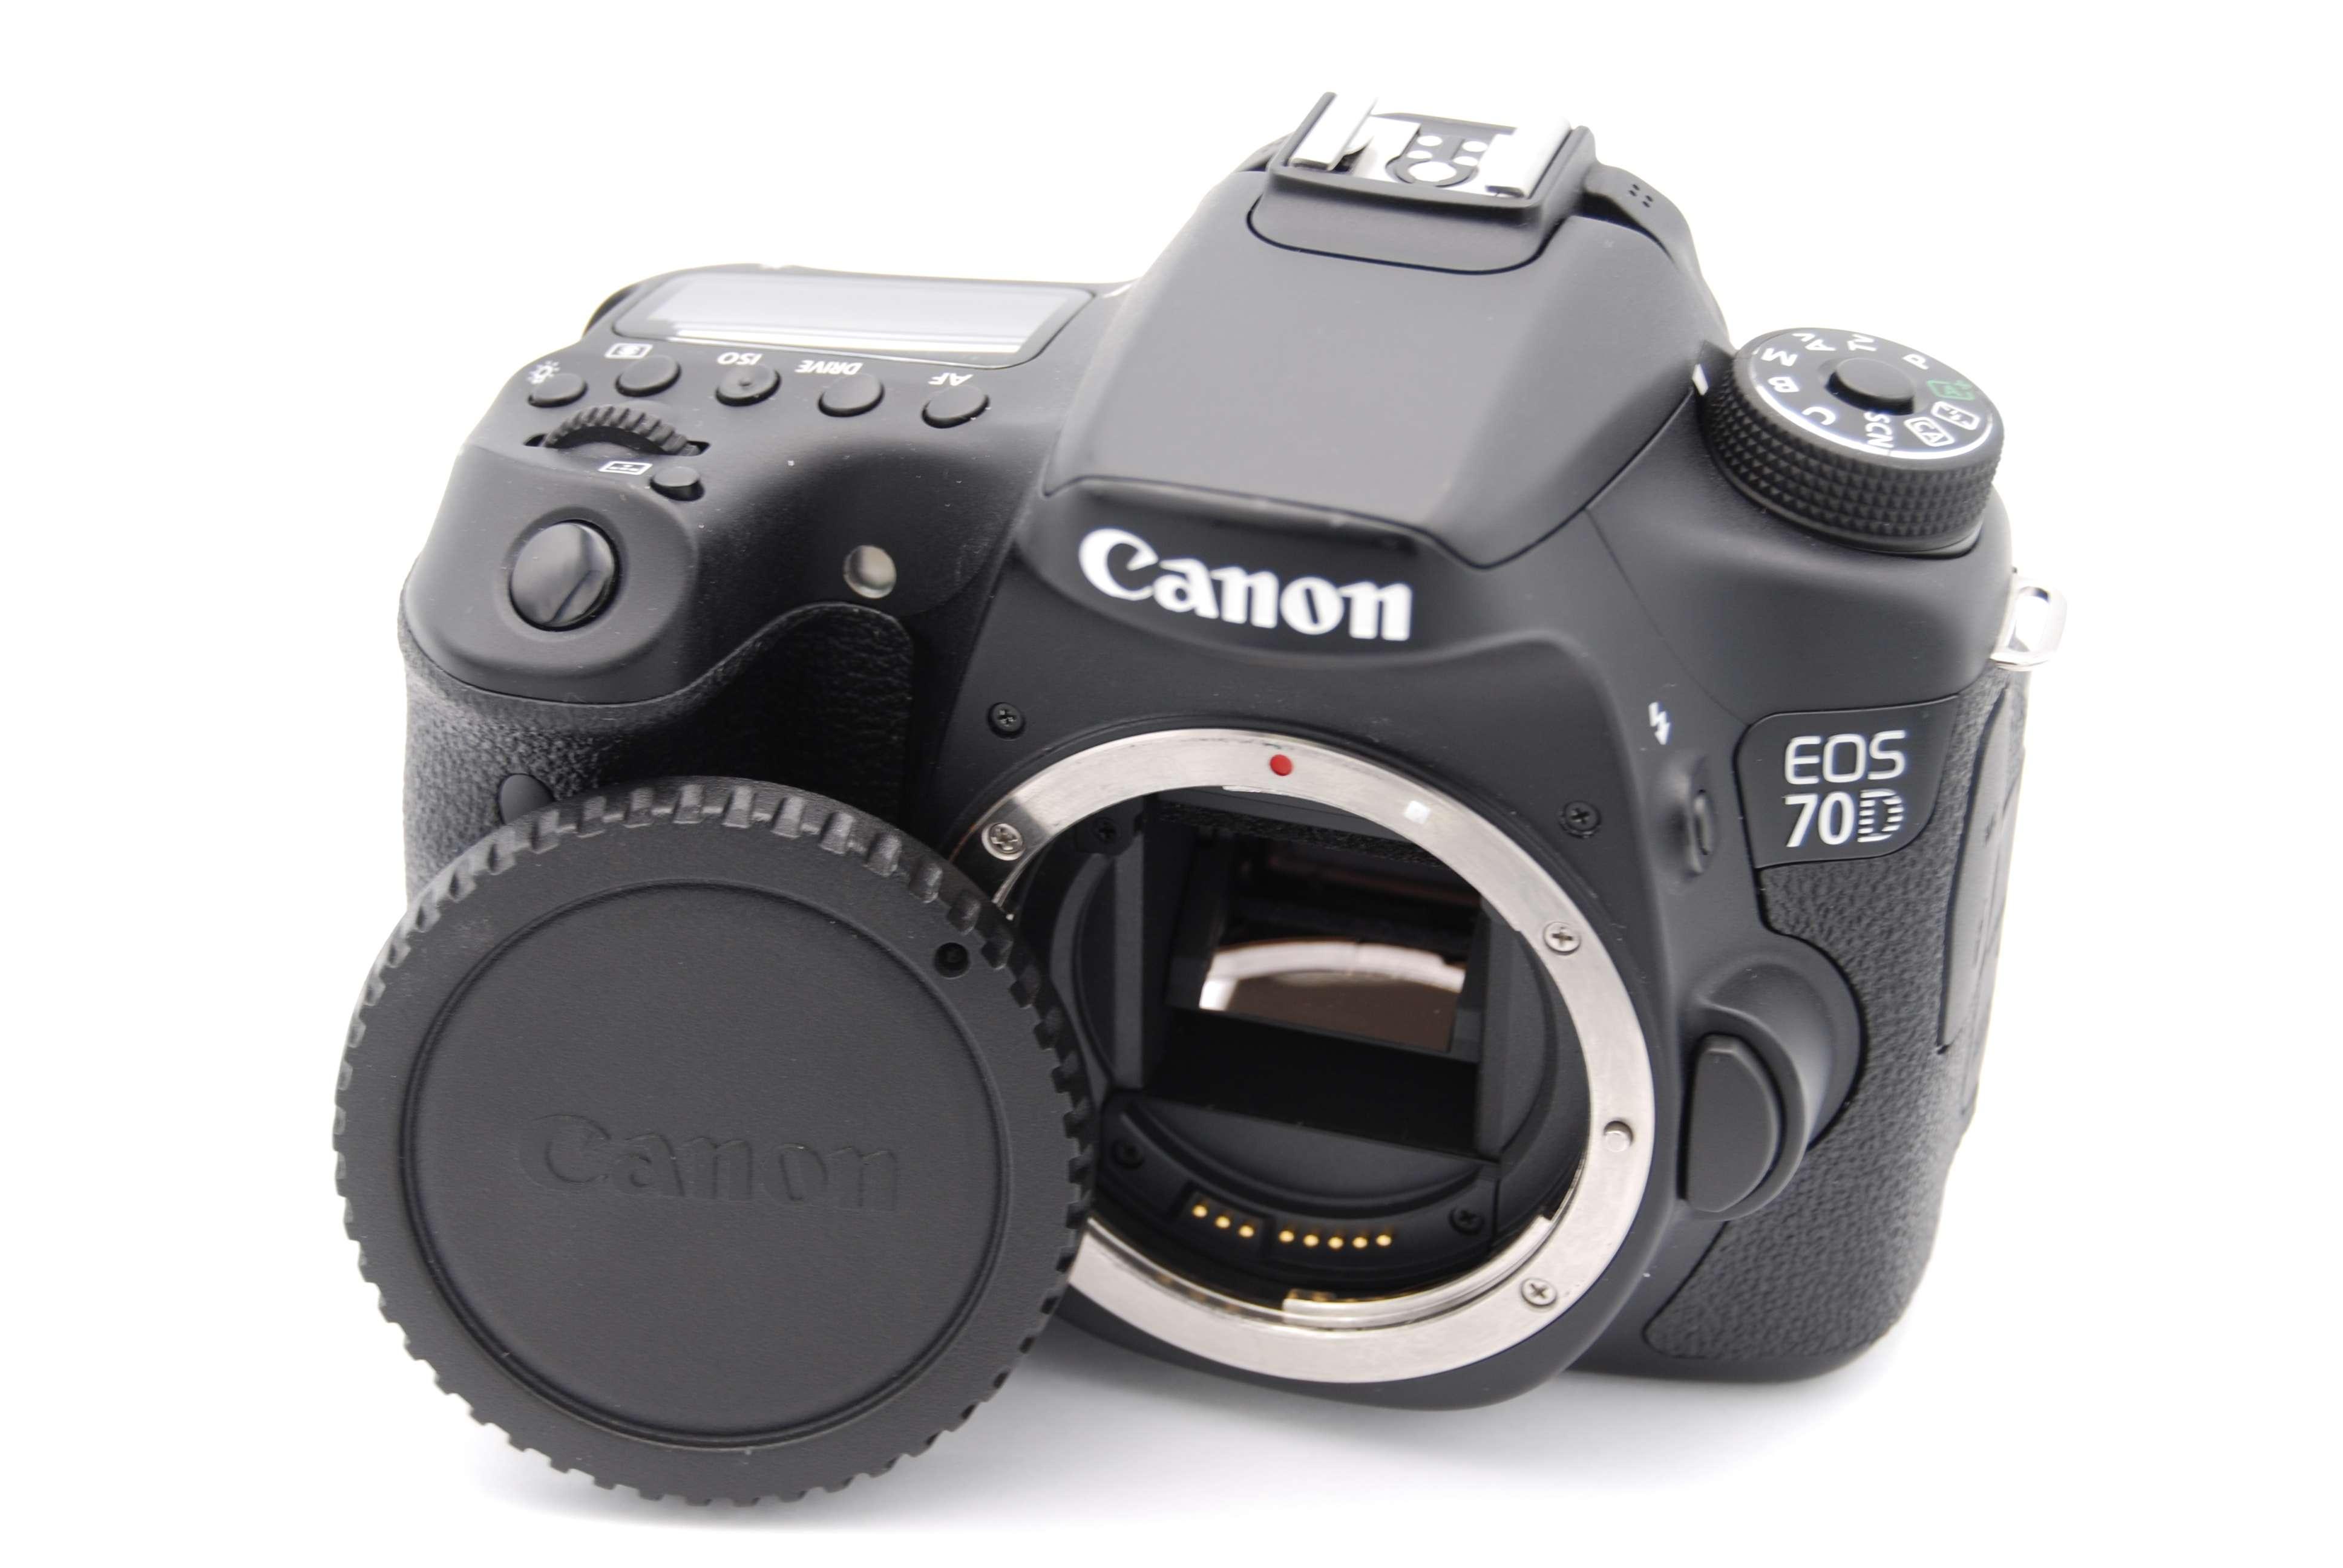 canon eos 70d 20 2 mp 3 39 39 screen digital slr camera body only 13803221596 ebay. Black Bedroom Furniture Sets. Home Design Ideas